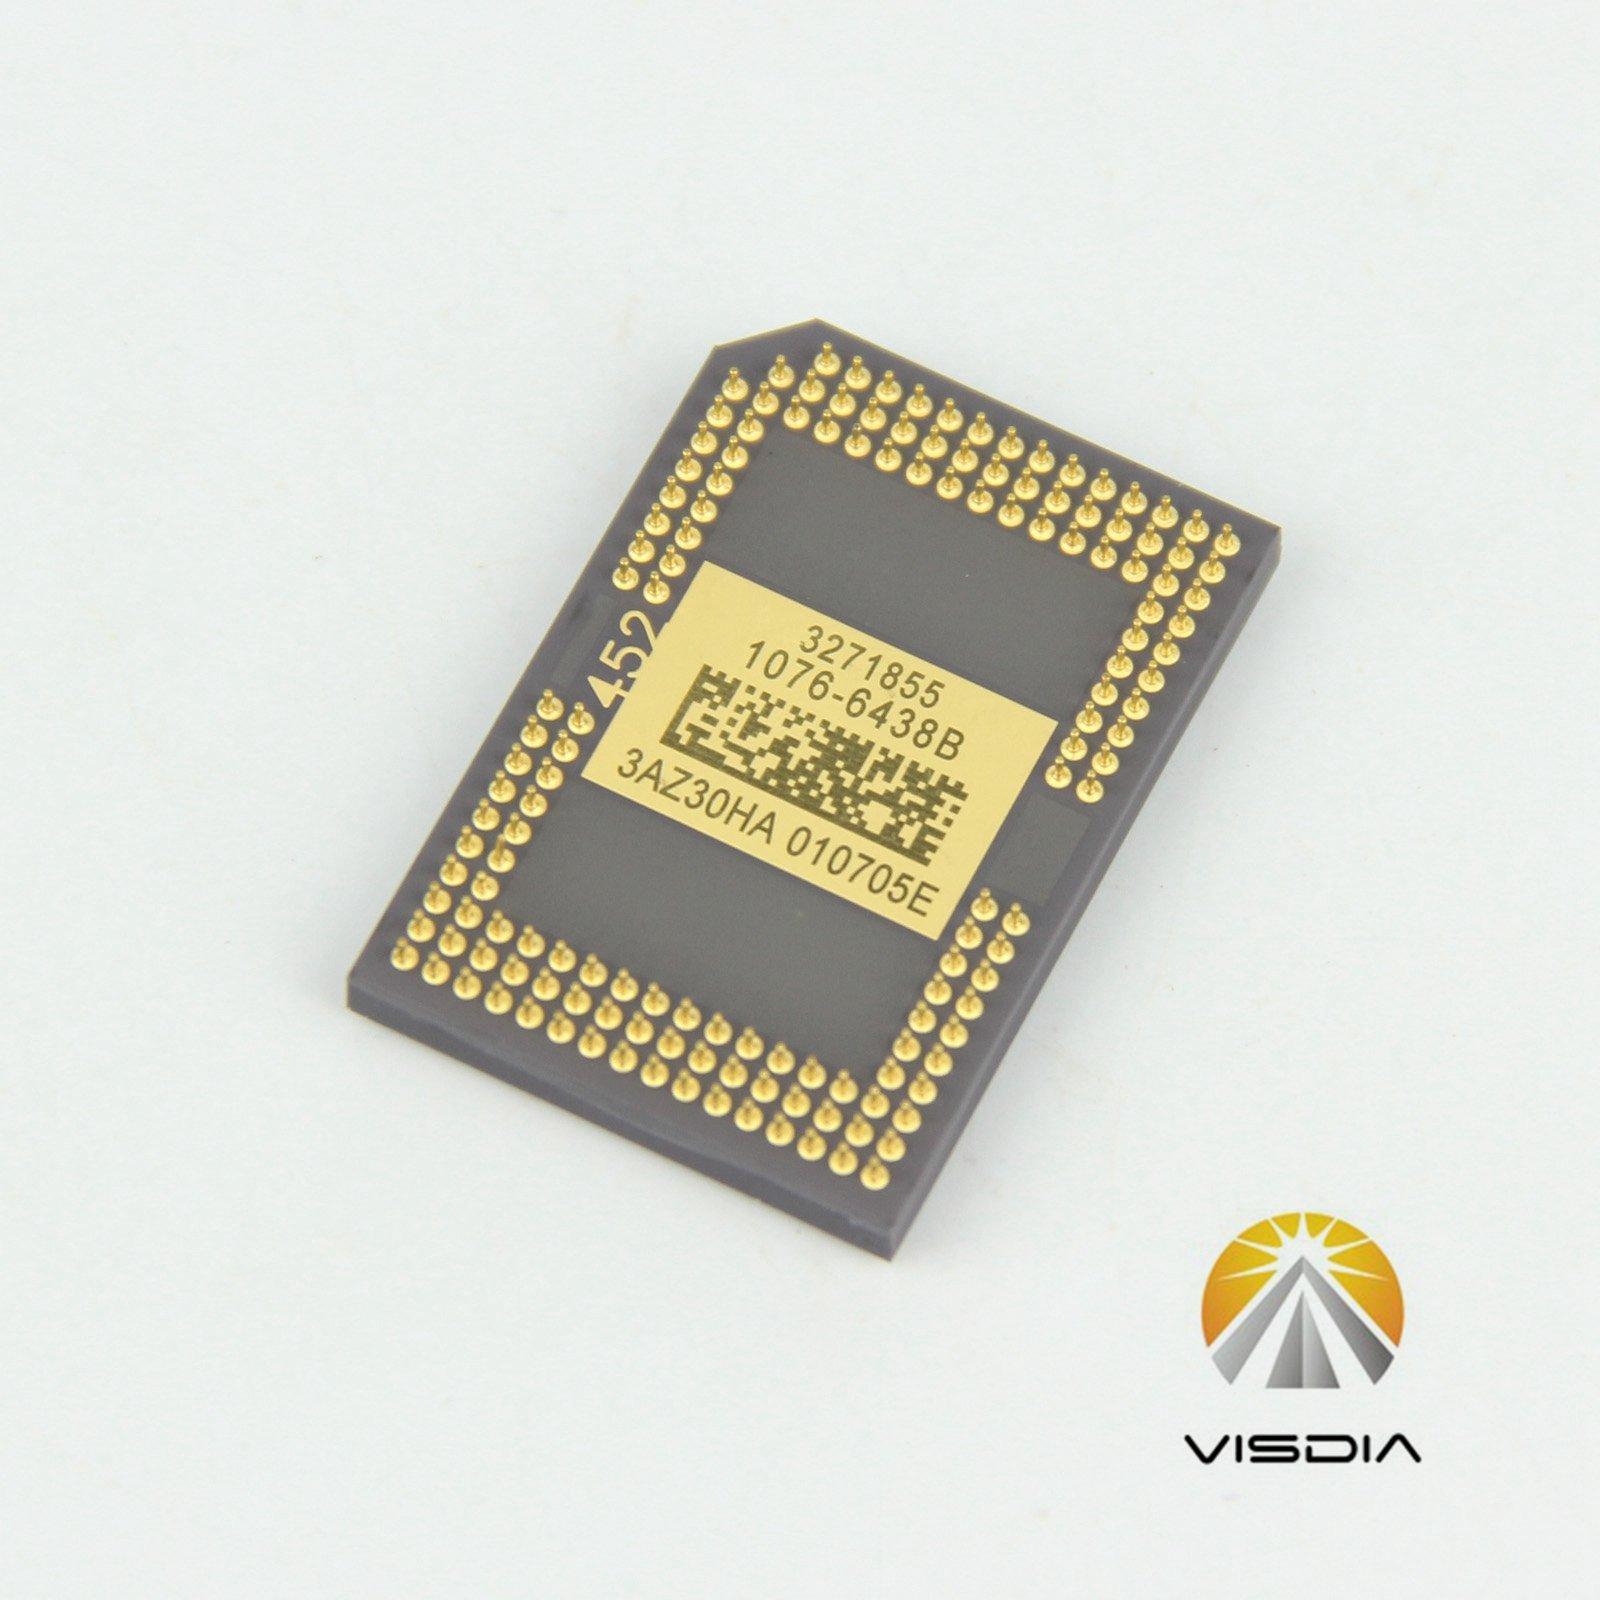 Newest Generation DLP Projector DMD Chip 1076-6438B 1076-6439B 1076-643AB Replacement for 1076-6038B 1076-6039B 1076-6138B 1076-6139B 1076-6339B